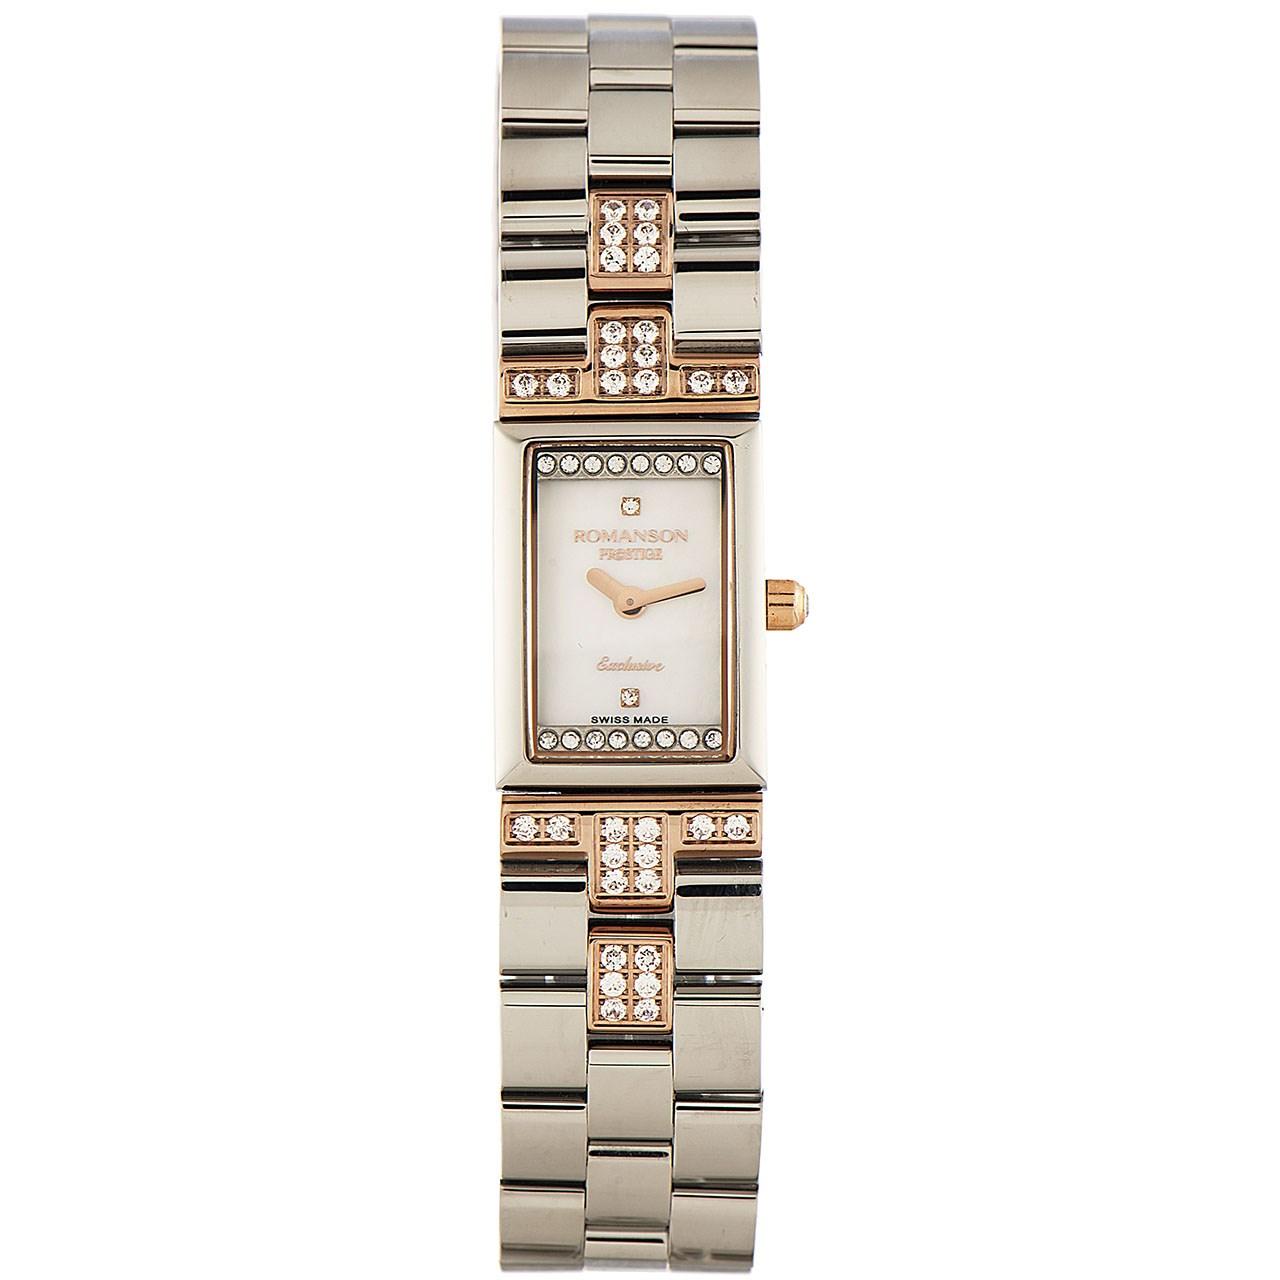 ساعت مچی عقربه ای زنانه رومانسون مدل RM3255CL1JM16R 9